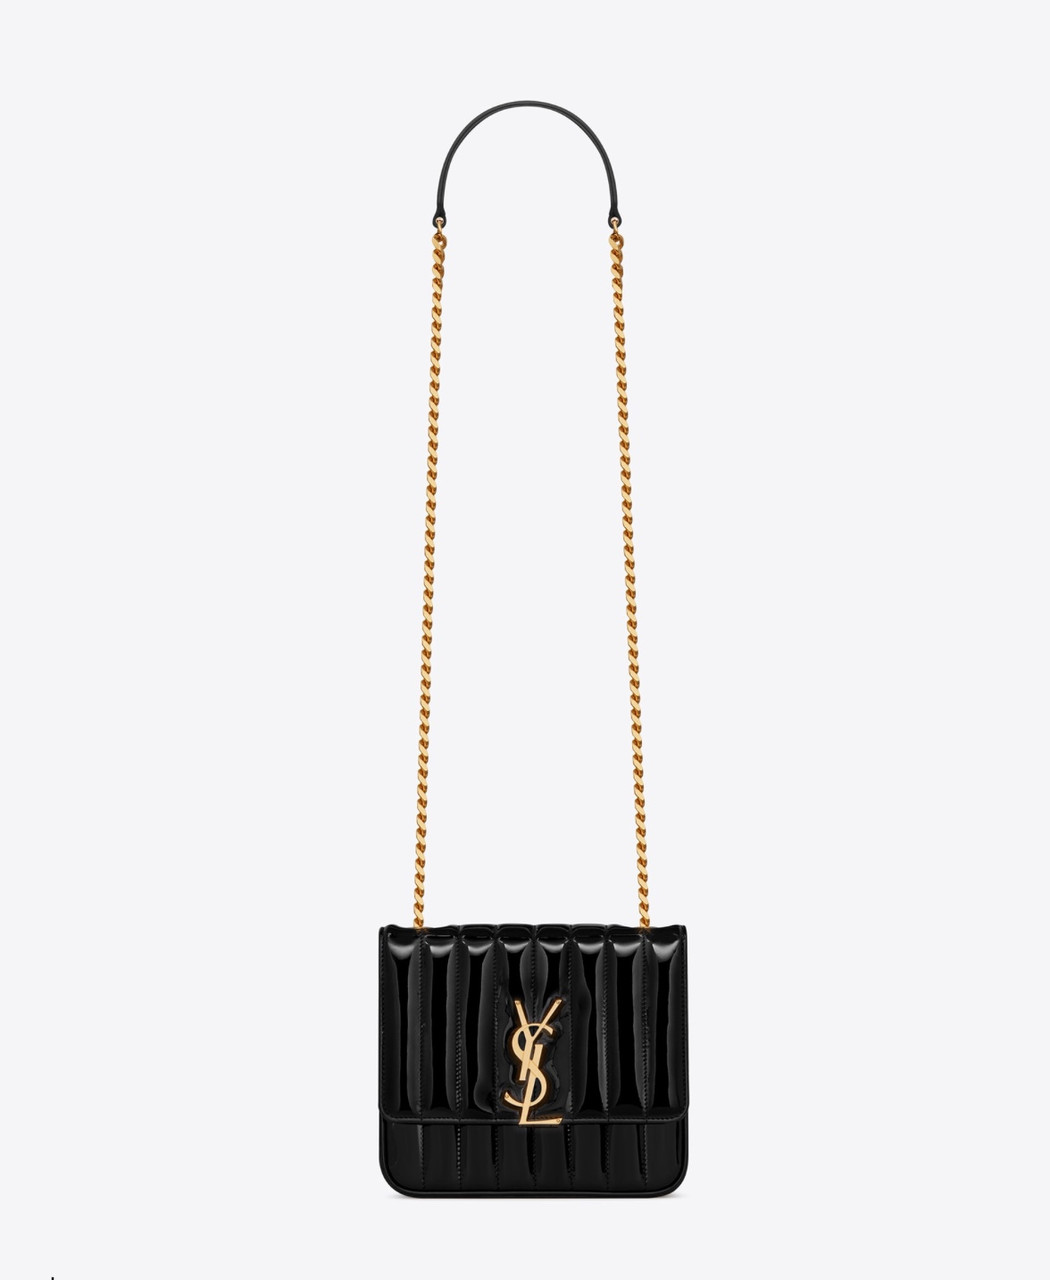 Сумка в стиле Yves Saint Laurent чёрная средняя